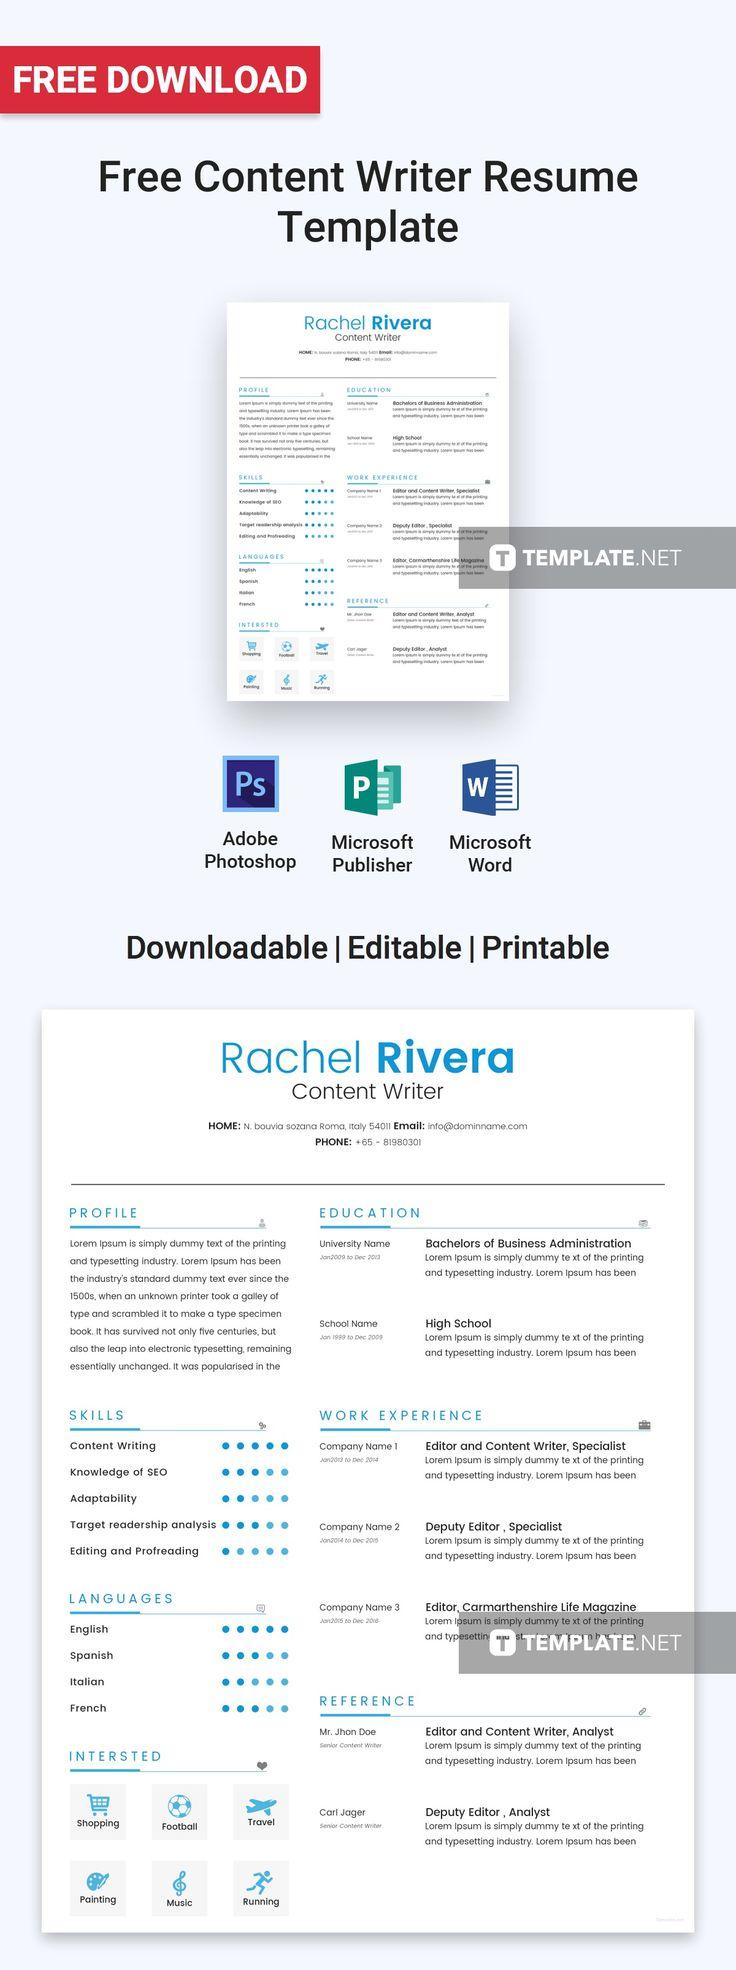 Free content writer resume resume design free resume